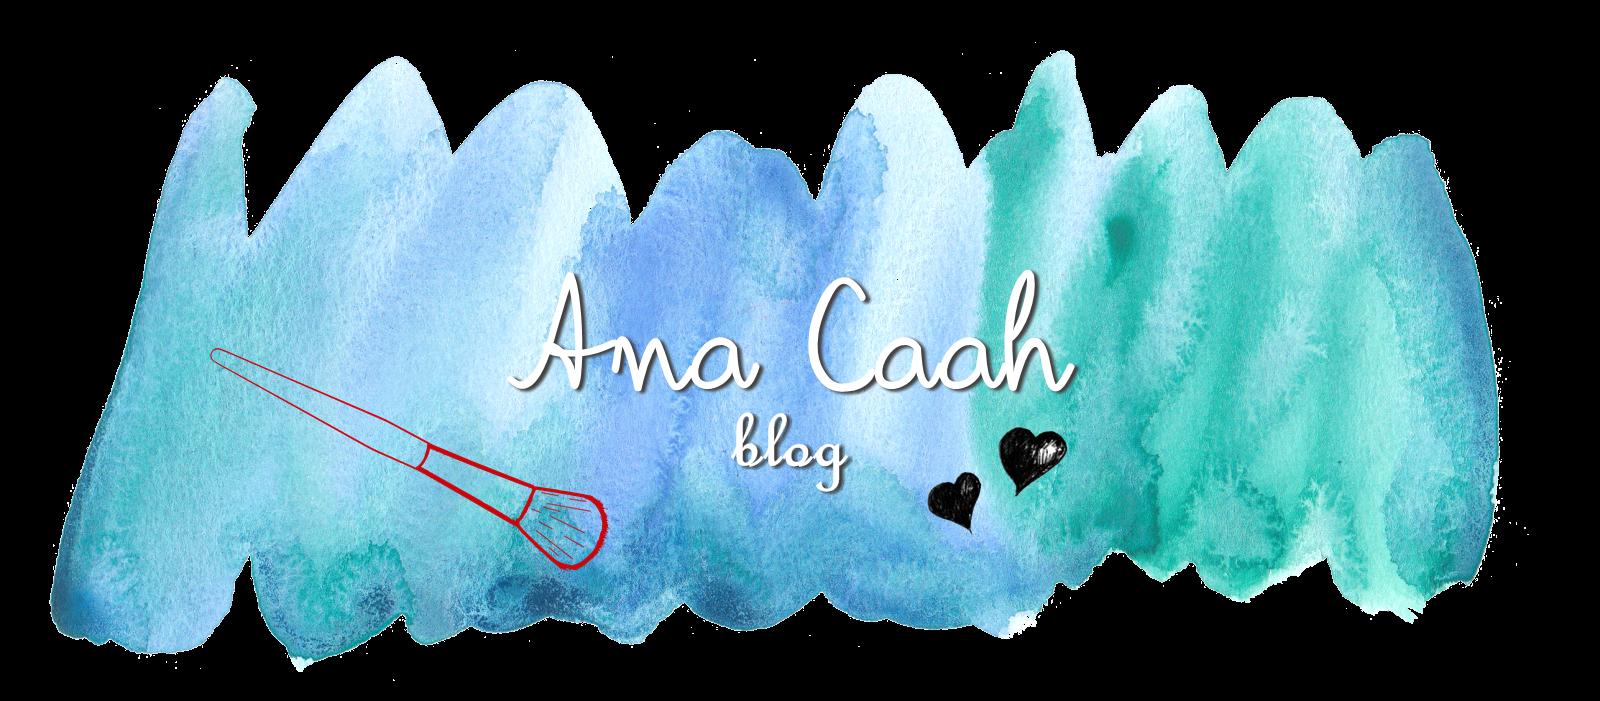 Ana Caah Blog